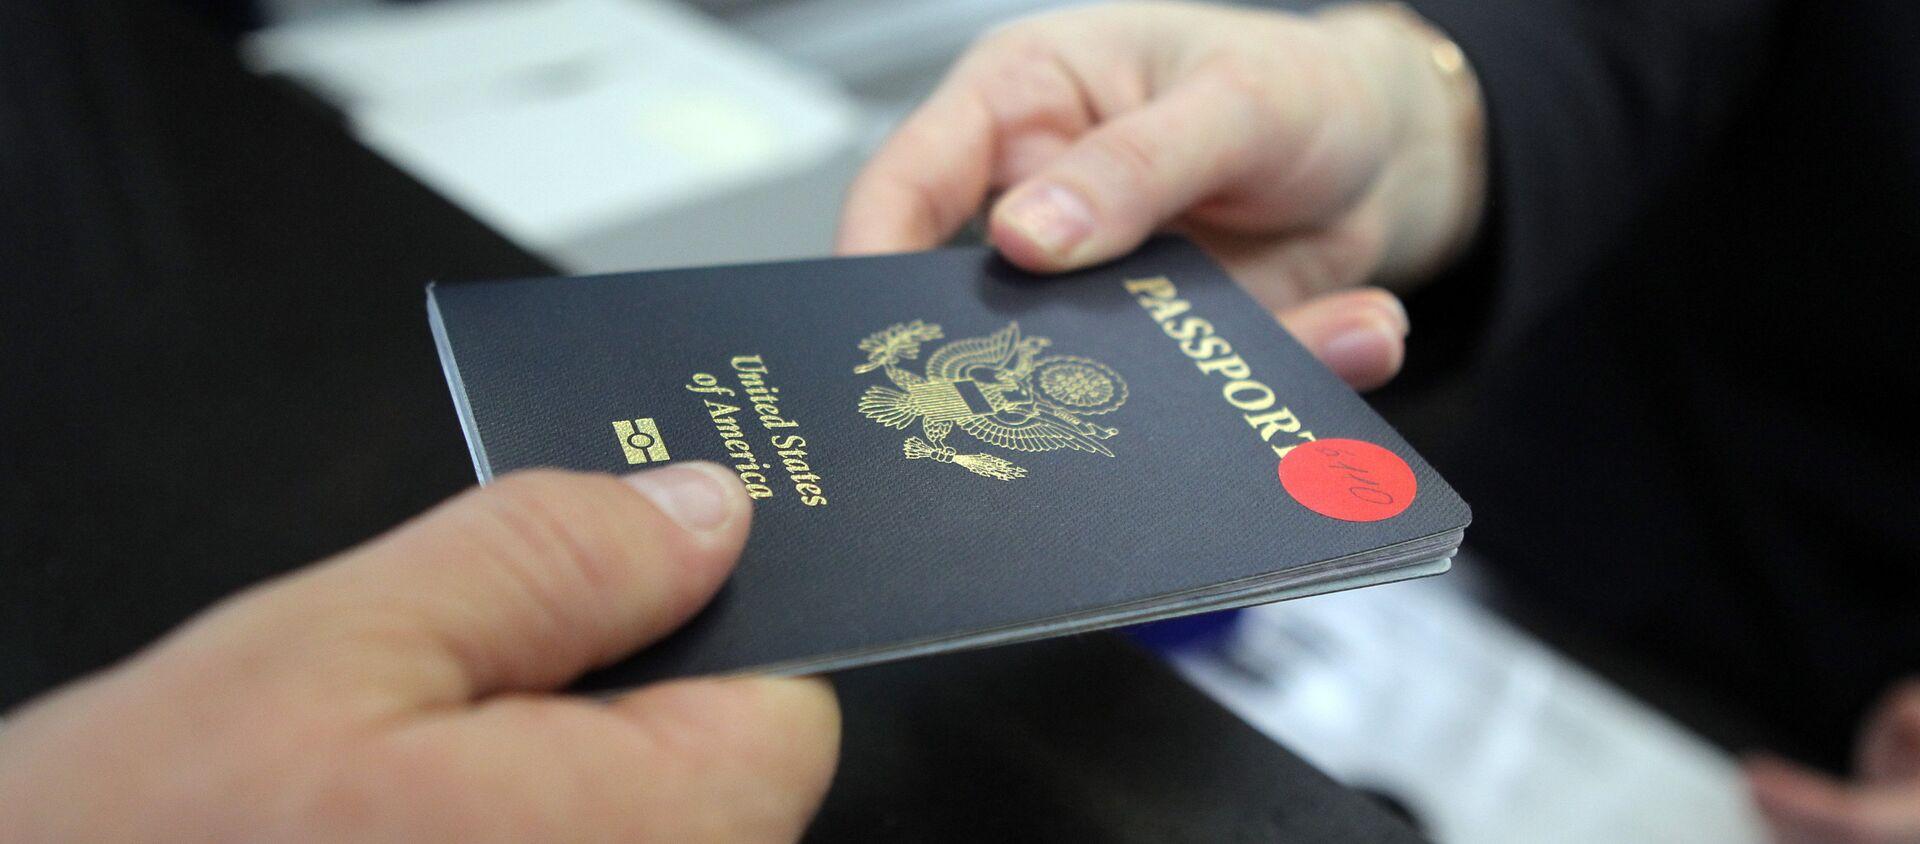 Пассажир предъявляет паспорт гражданина США - Sputnik Армения, 1920, 26.04.2021